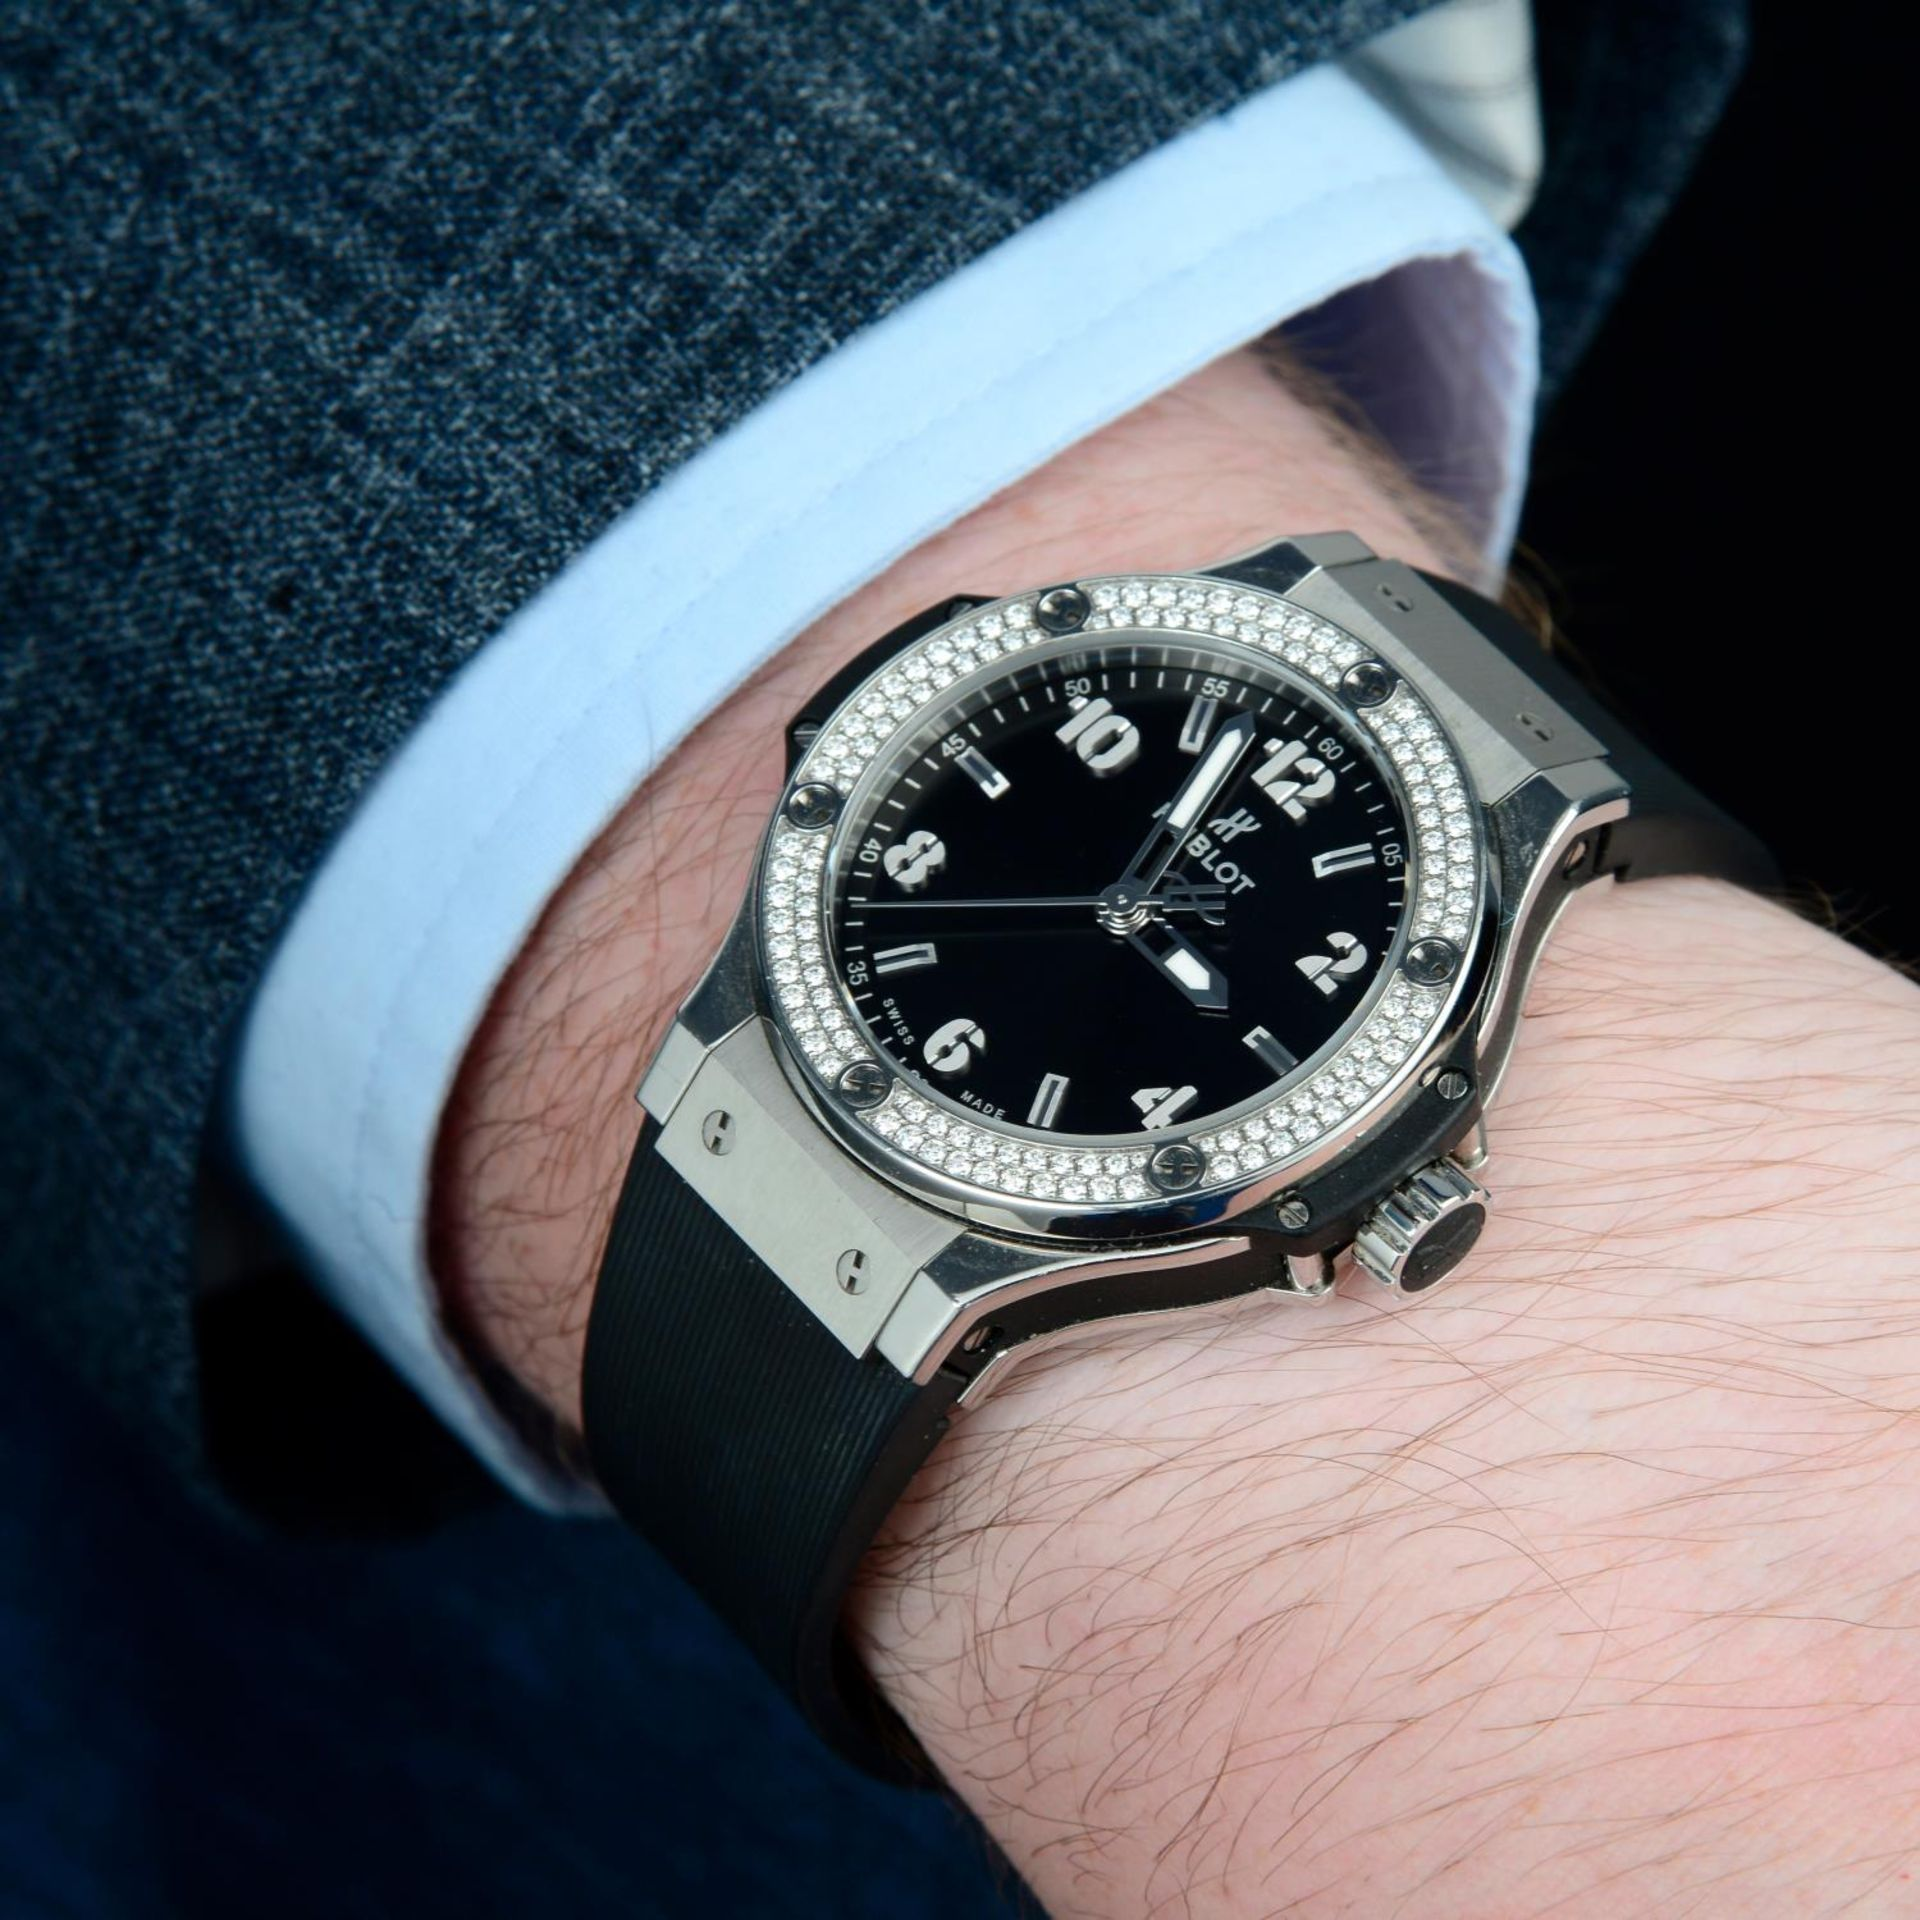 HUBLOT - a Big Bang wrist watch. - Bild 3 aus 6